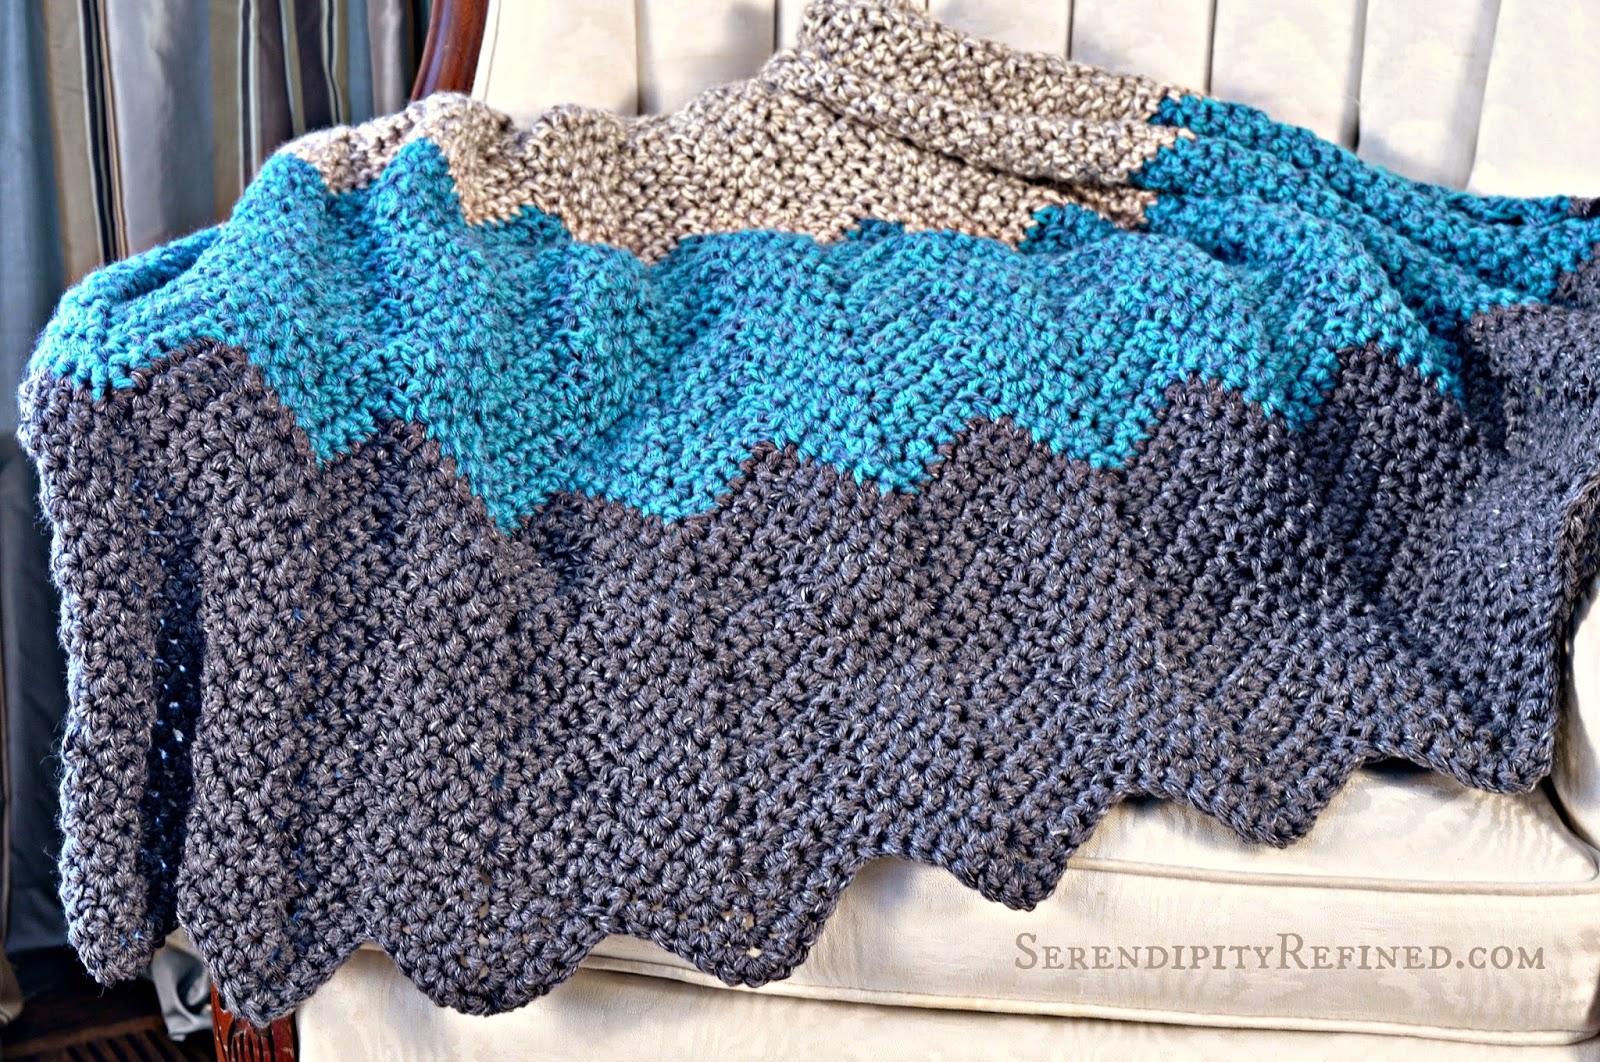 5c2206cada Serendipity Refined Blog  Easy Crochet Throw Blanket Pattern